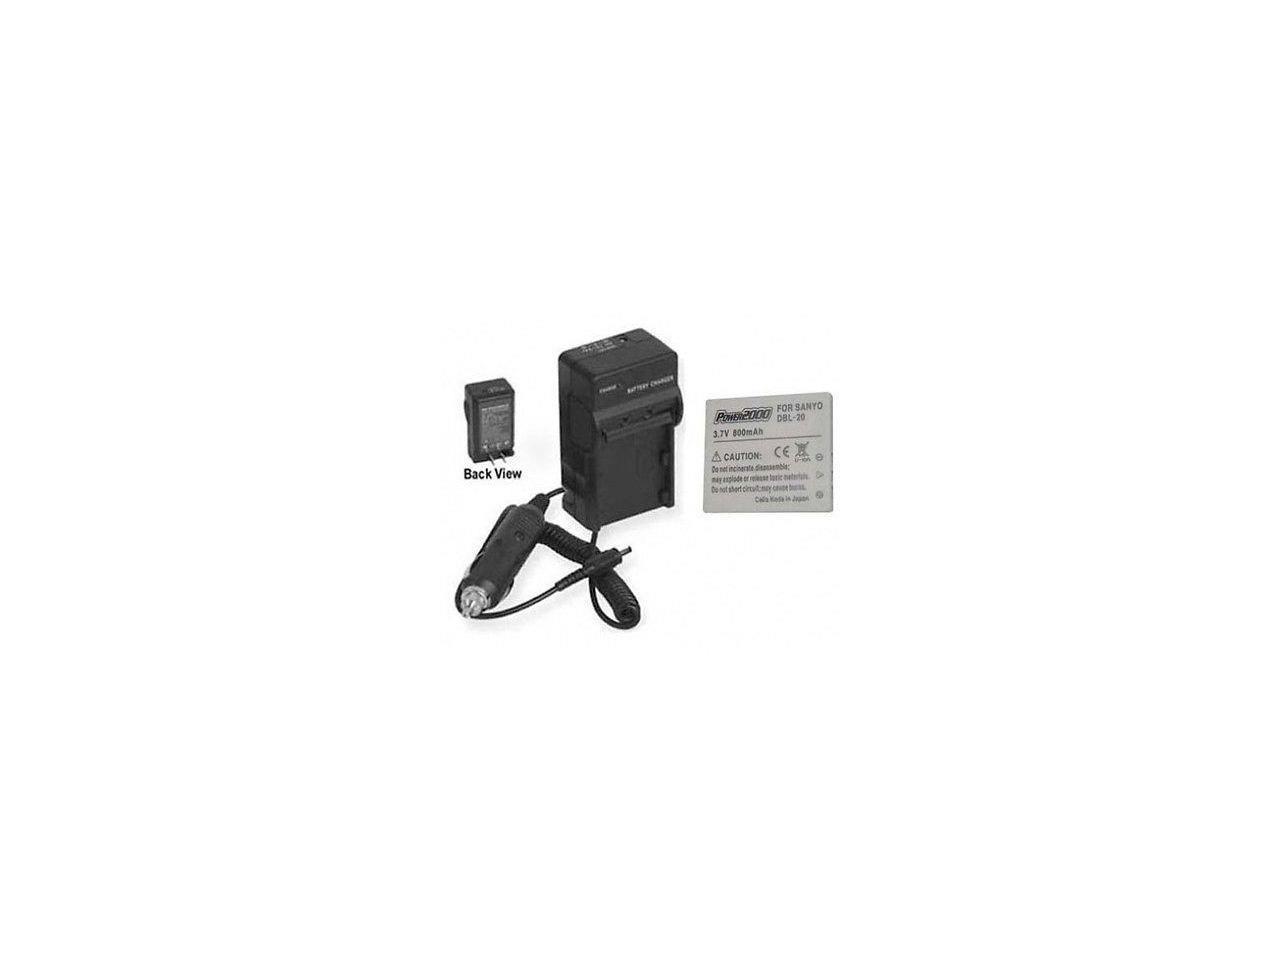 Sanyo Xacti DSC-C1 Camcorder External Microphone